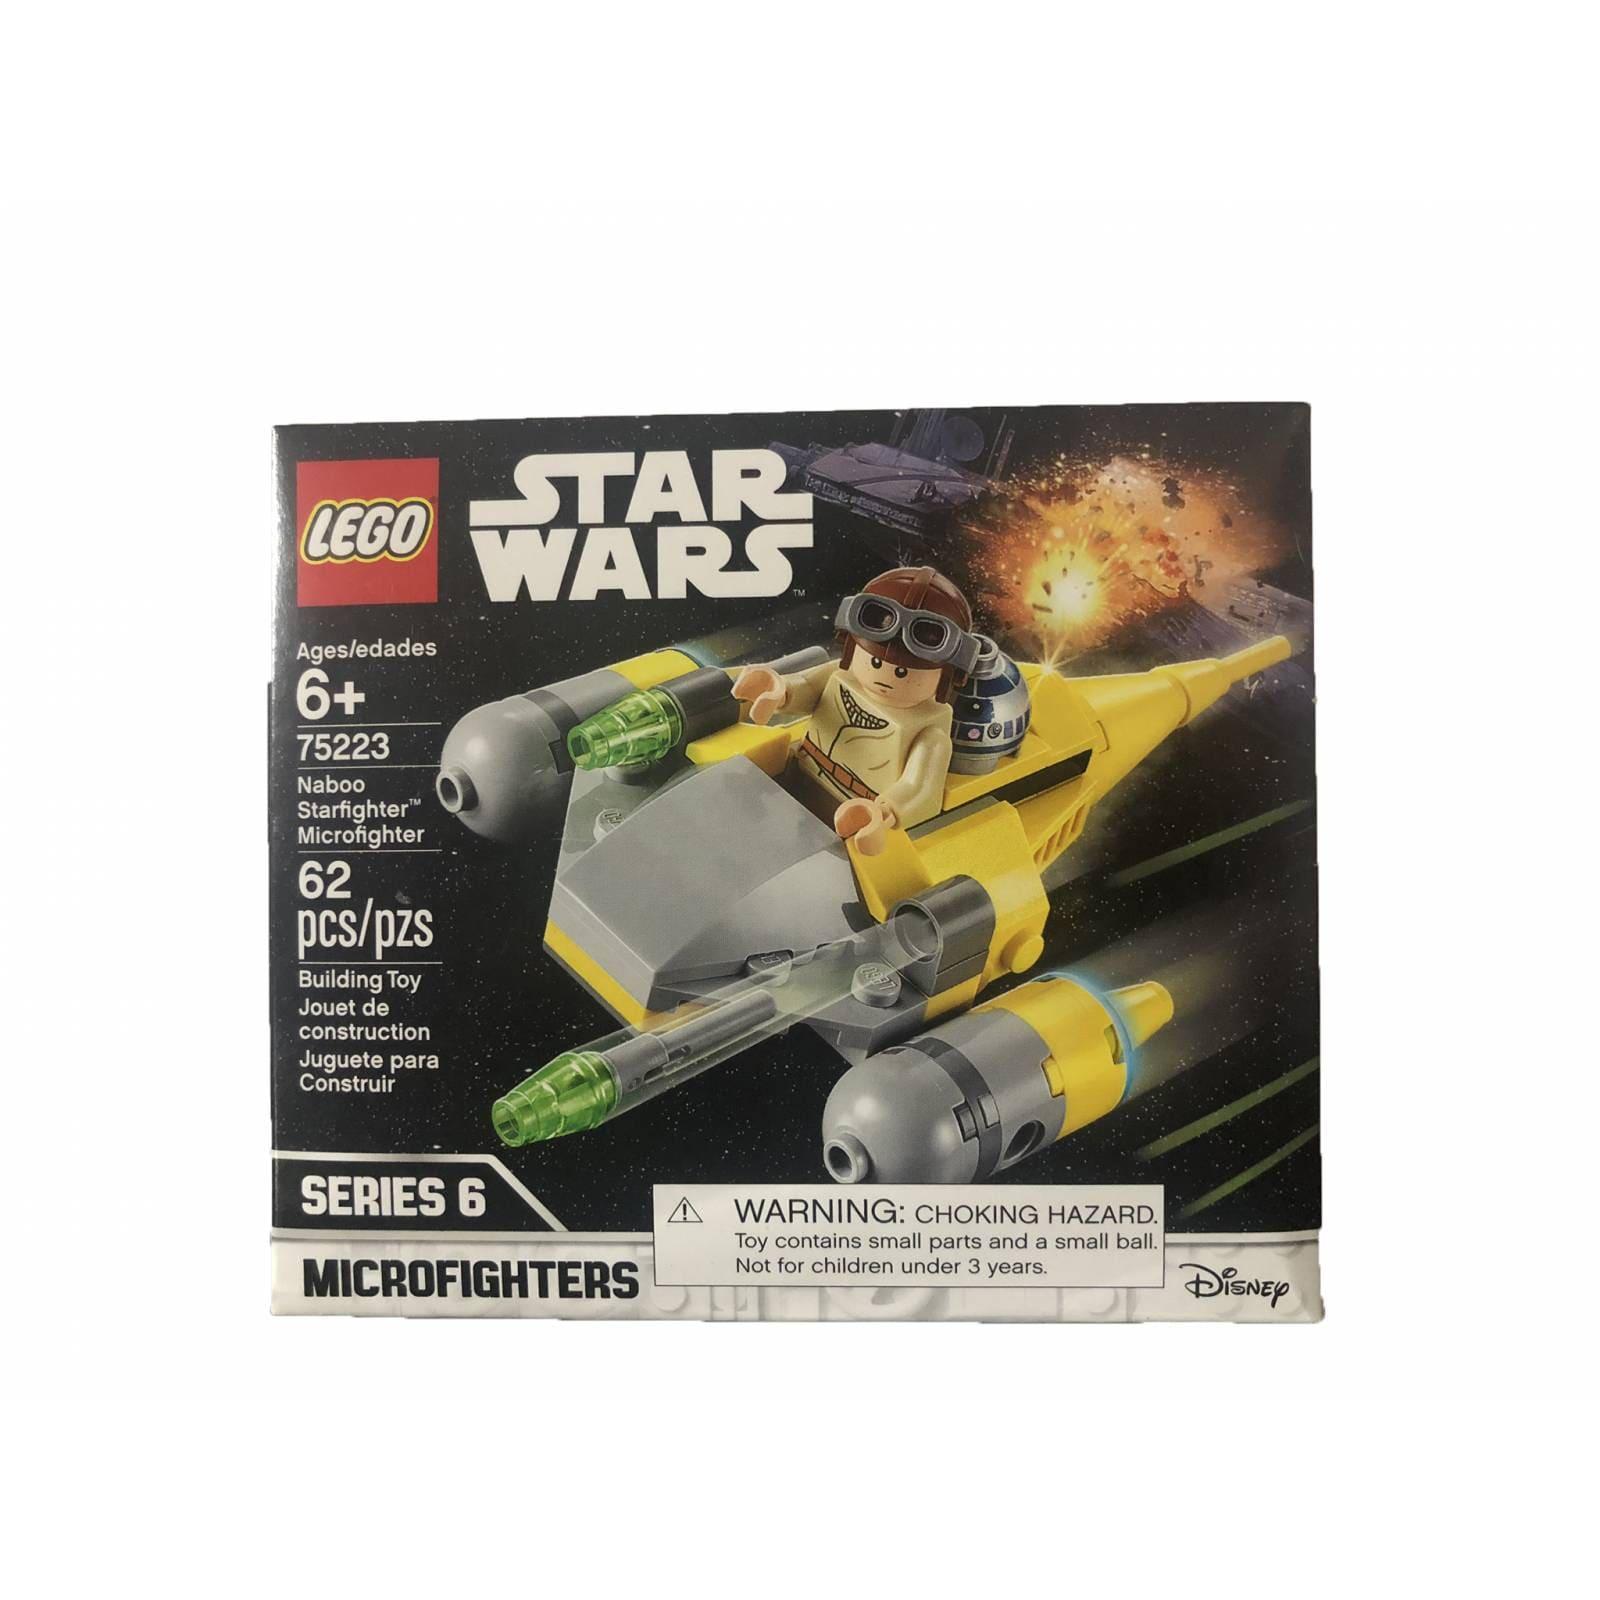 LEGO Star Wars MOD. 75223 Microfighter Naboo Starfighter, 62 piezas. Series 6. Disney.